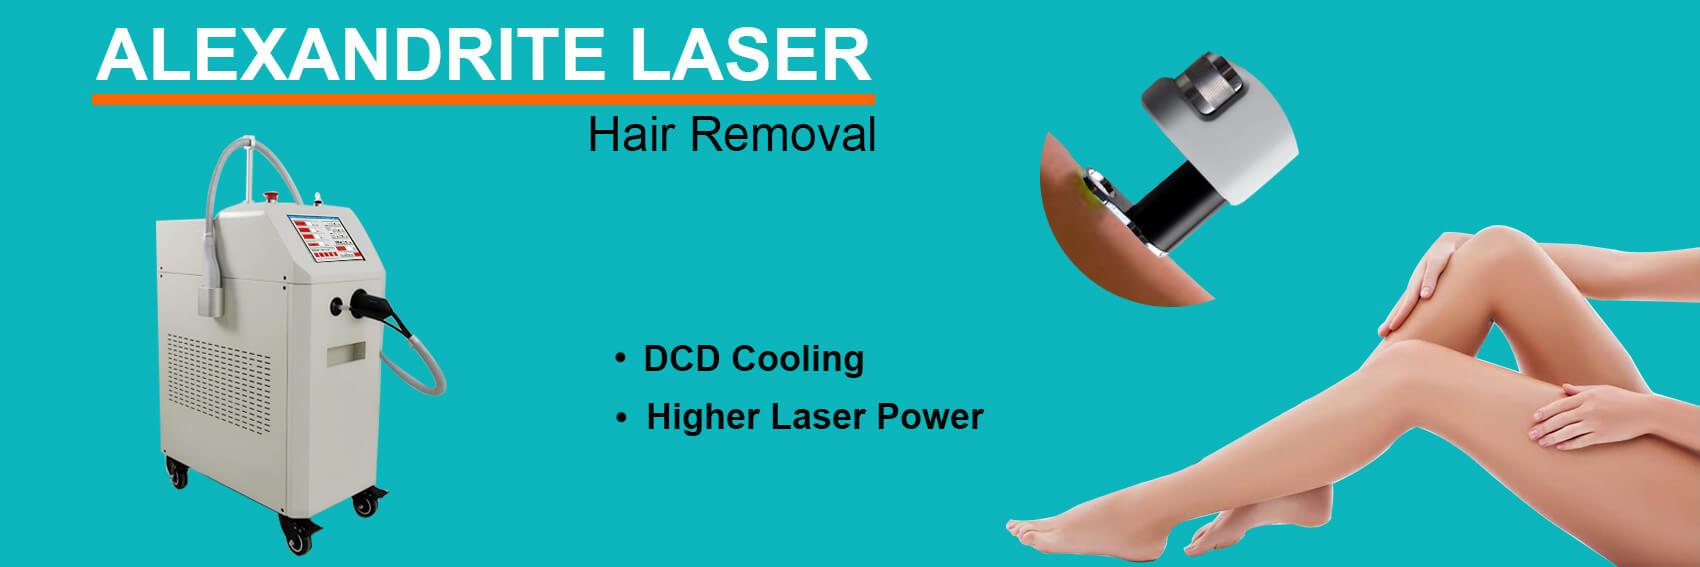 755nm Alexandrite Laser Hair Removal Machine